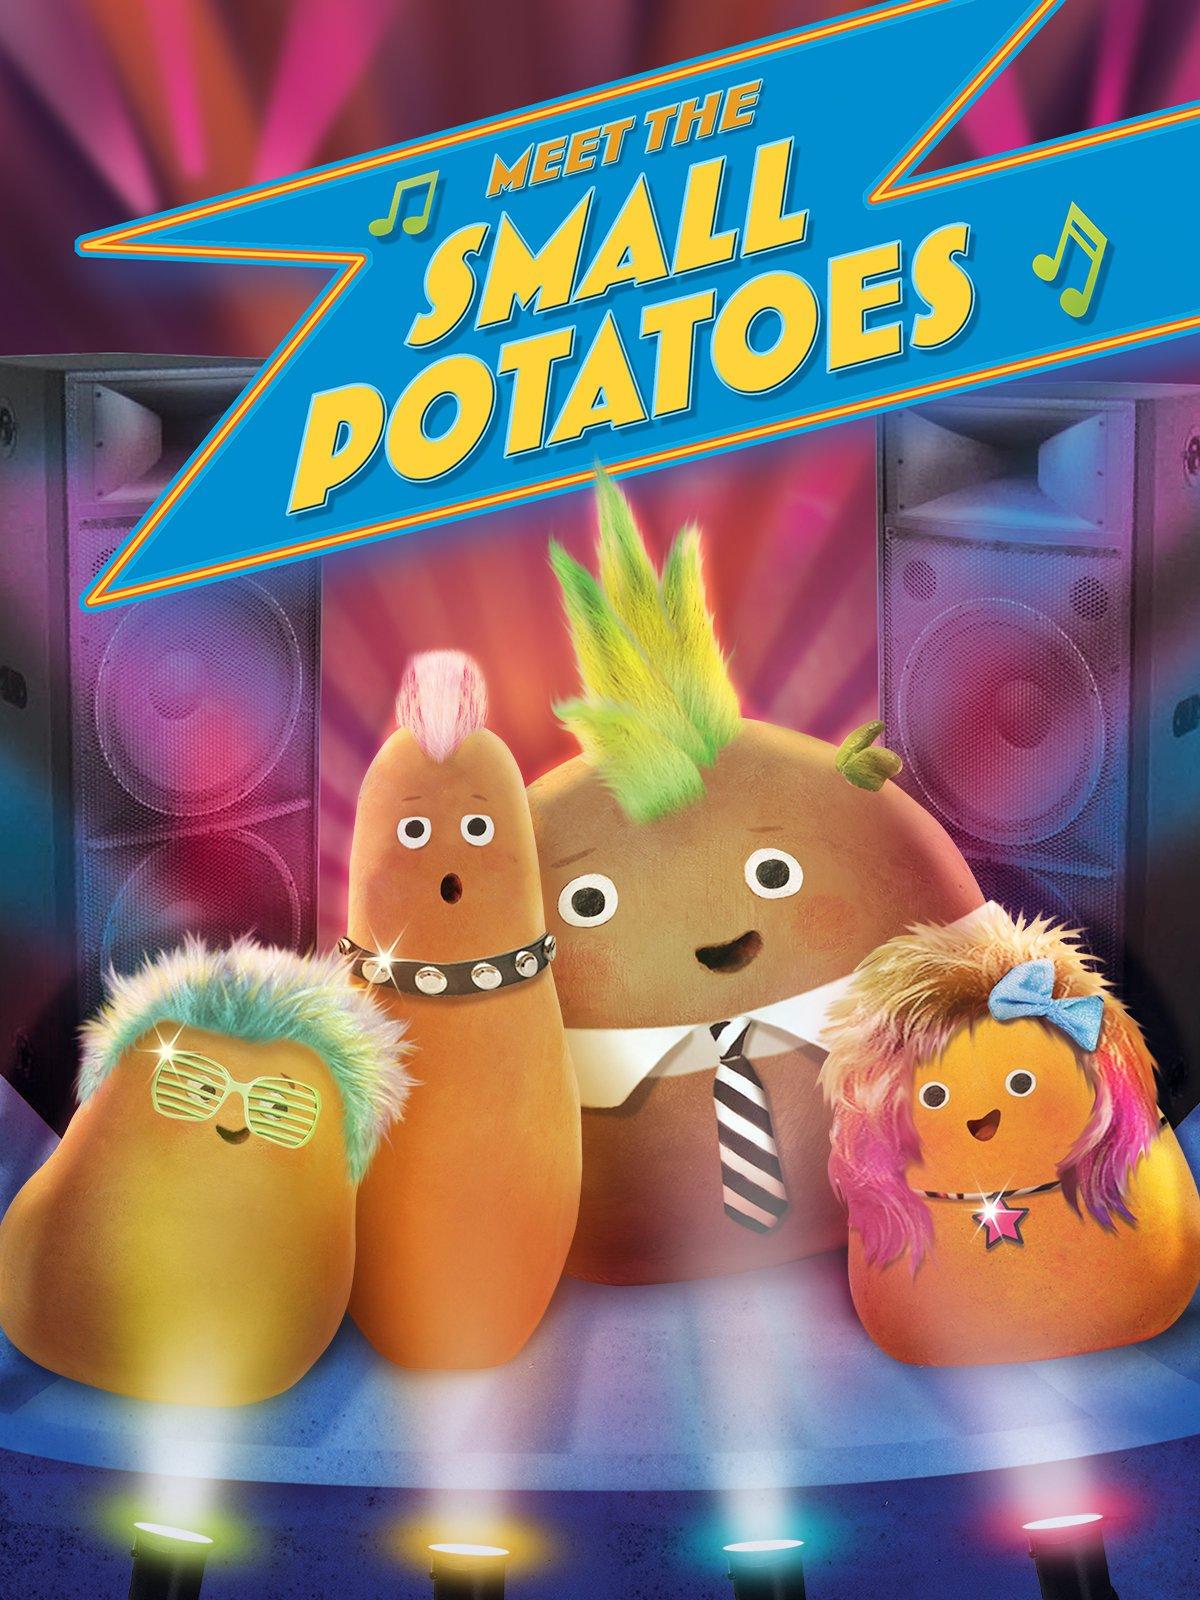 Amazon.com: Meet The Small Potatoes: Malcolm McDowell, Jasper Newell, Pablo Cano Carciofa, Morgan Hartley: Amazon Digital Services LLC